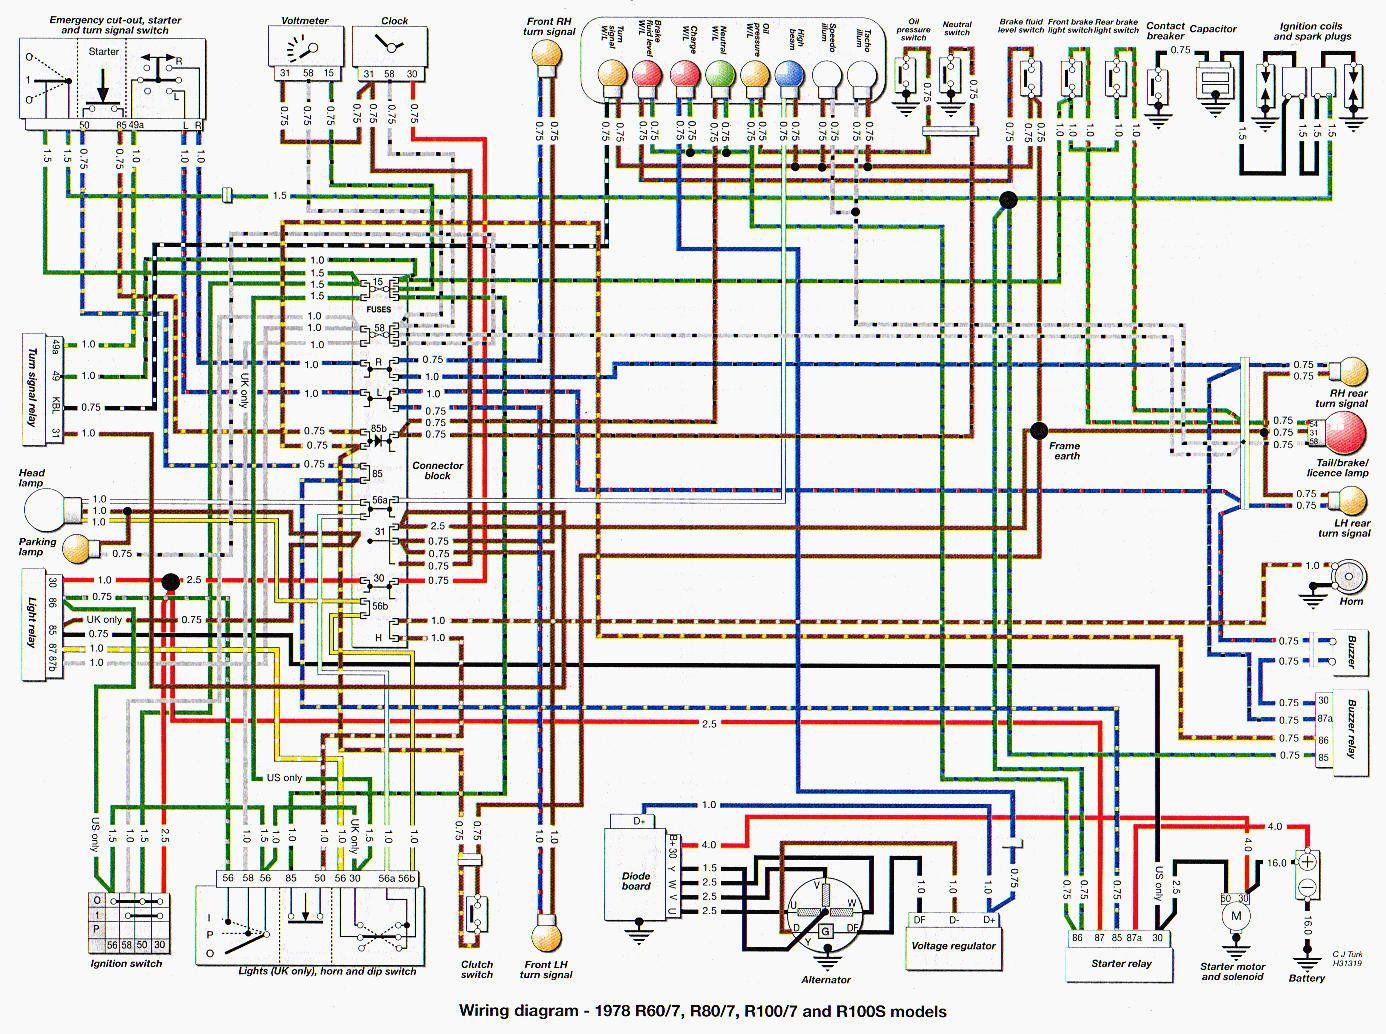 hight resolution of bmw r80 wiring diagram google s u00f8gning bmw r80 7 2008 mazda 6 headlight bulb mazda